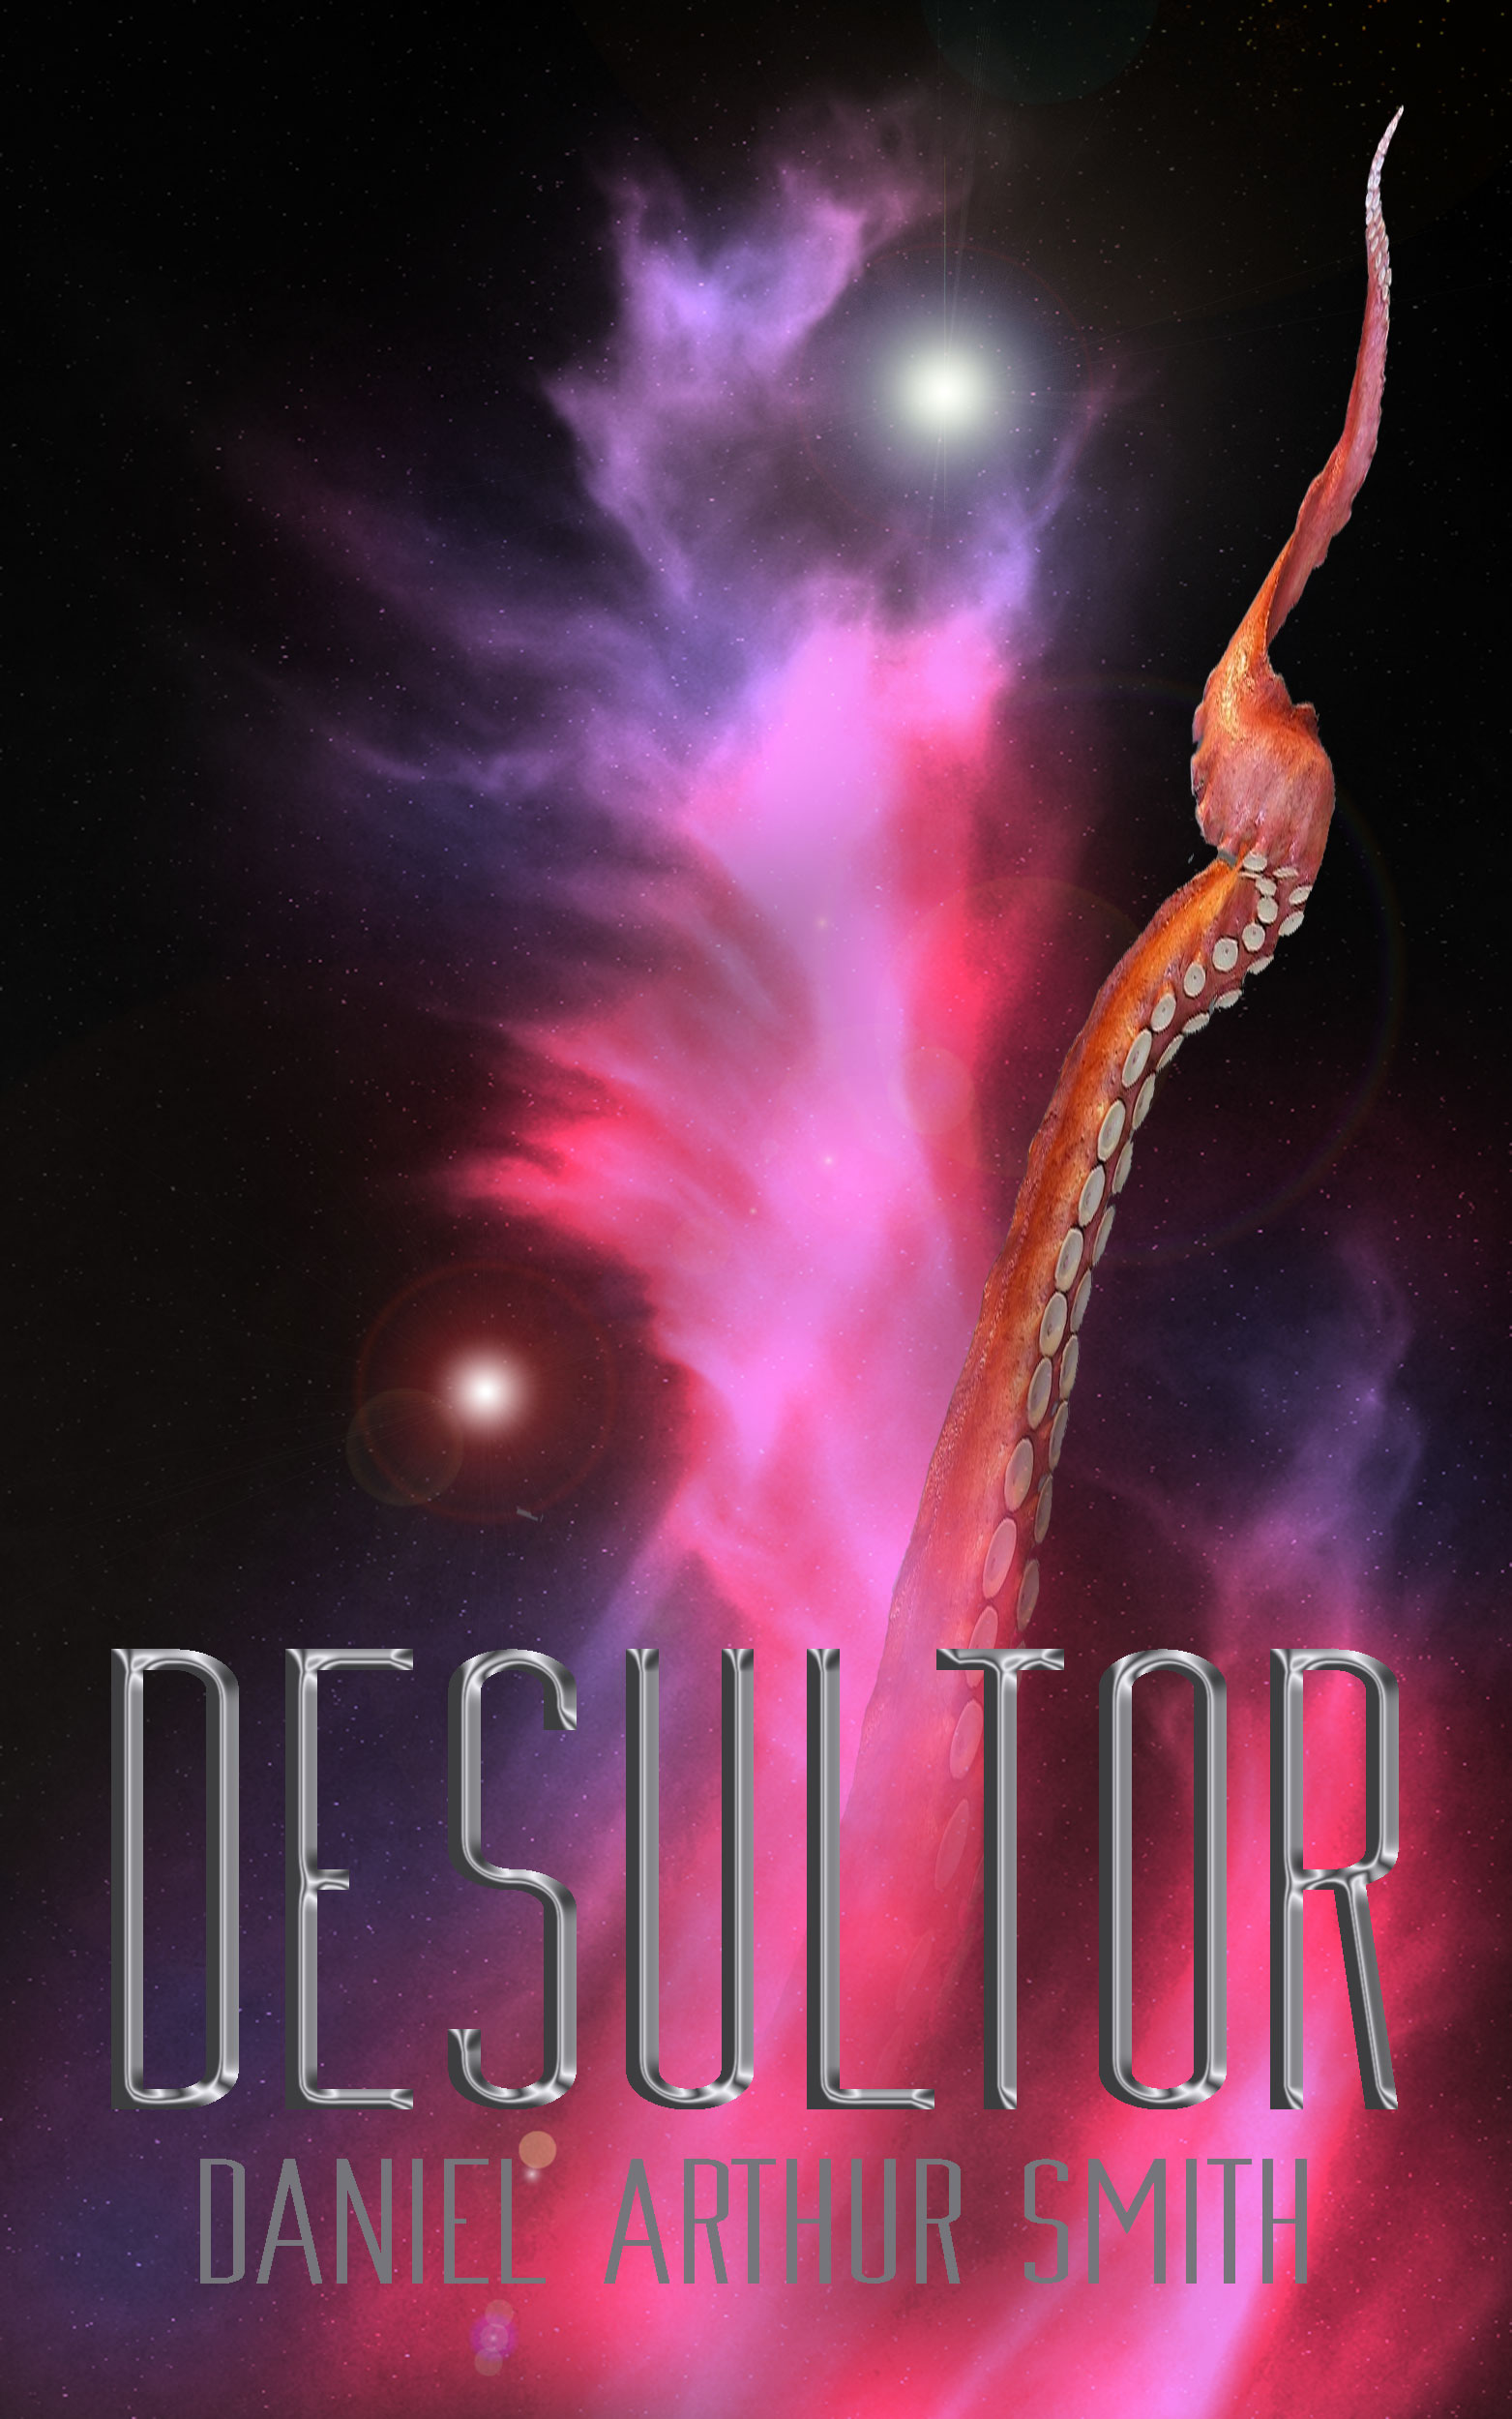 Desultor-Nebula-cover